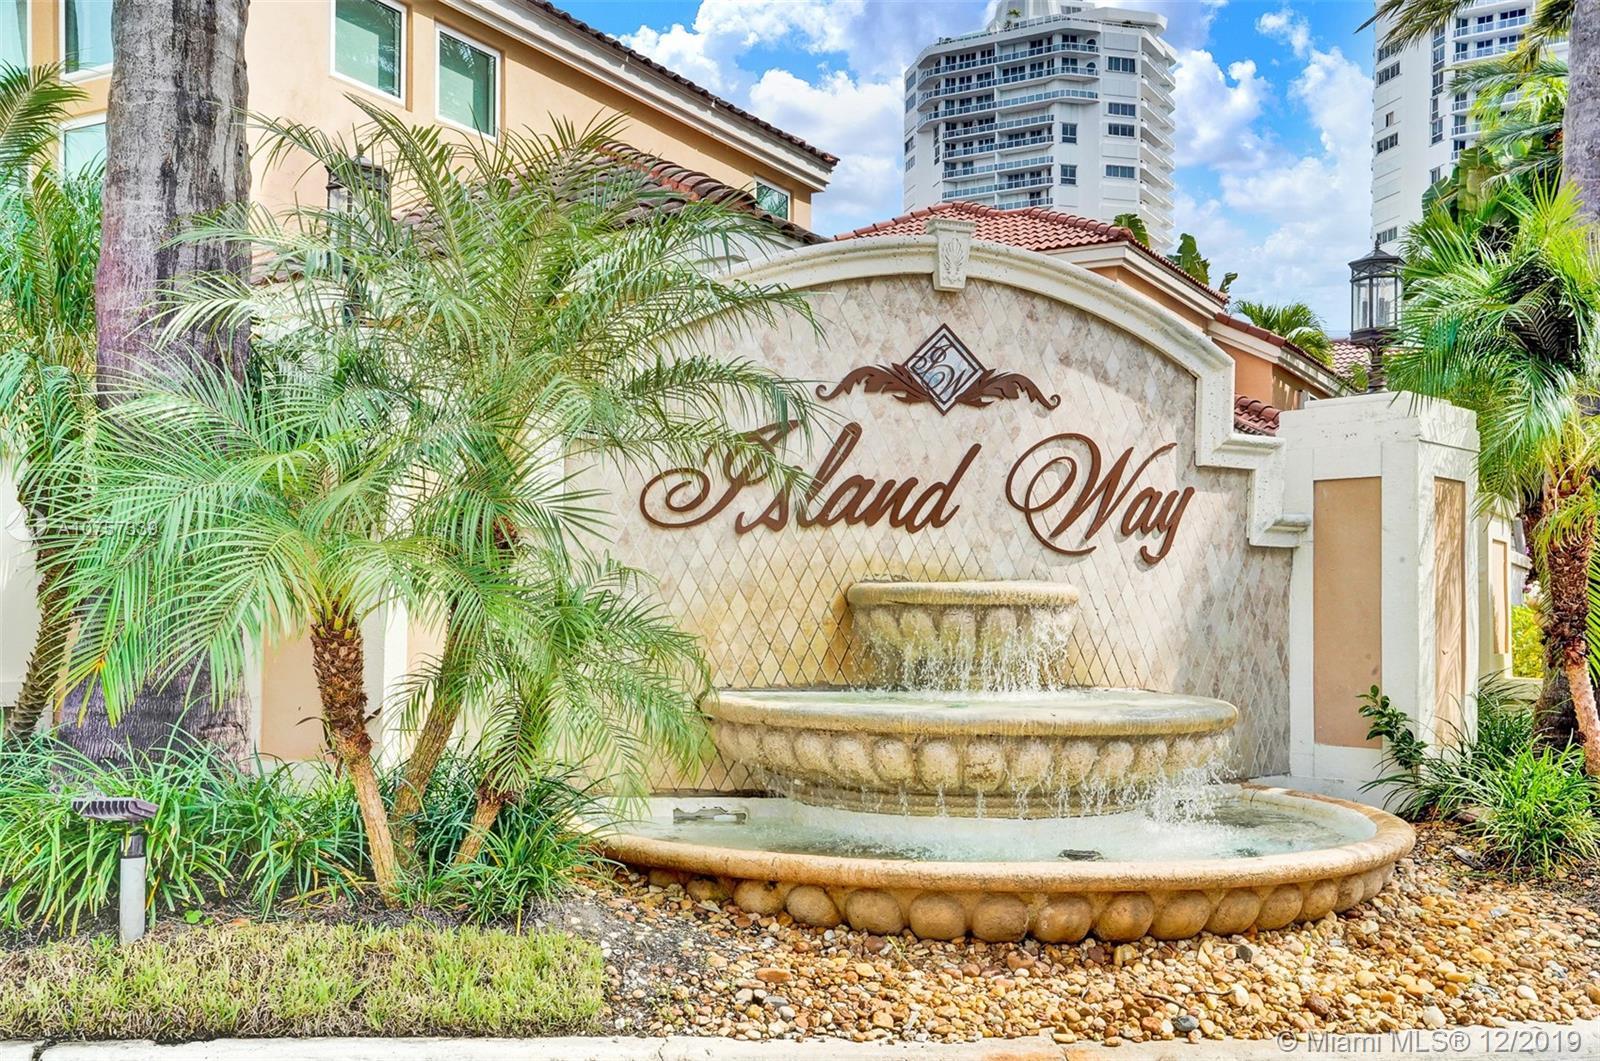 3764 NE 208th Ter, Aventura, FL 33180 - Aventura, FL real estate listing